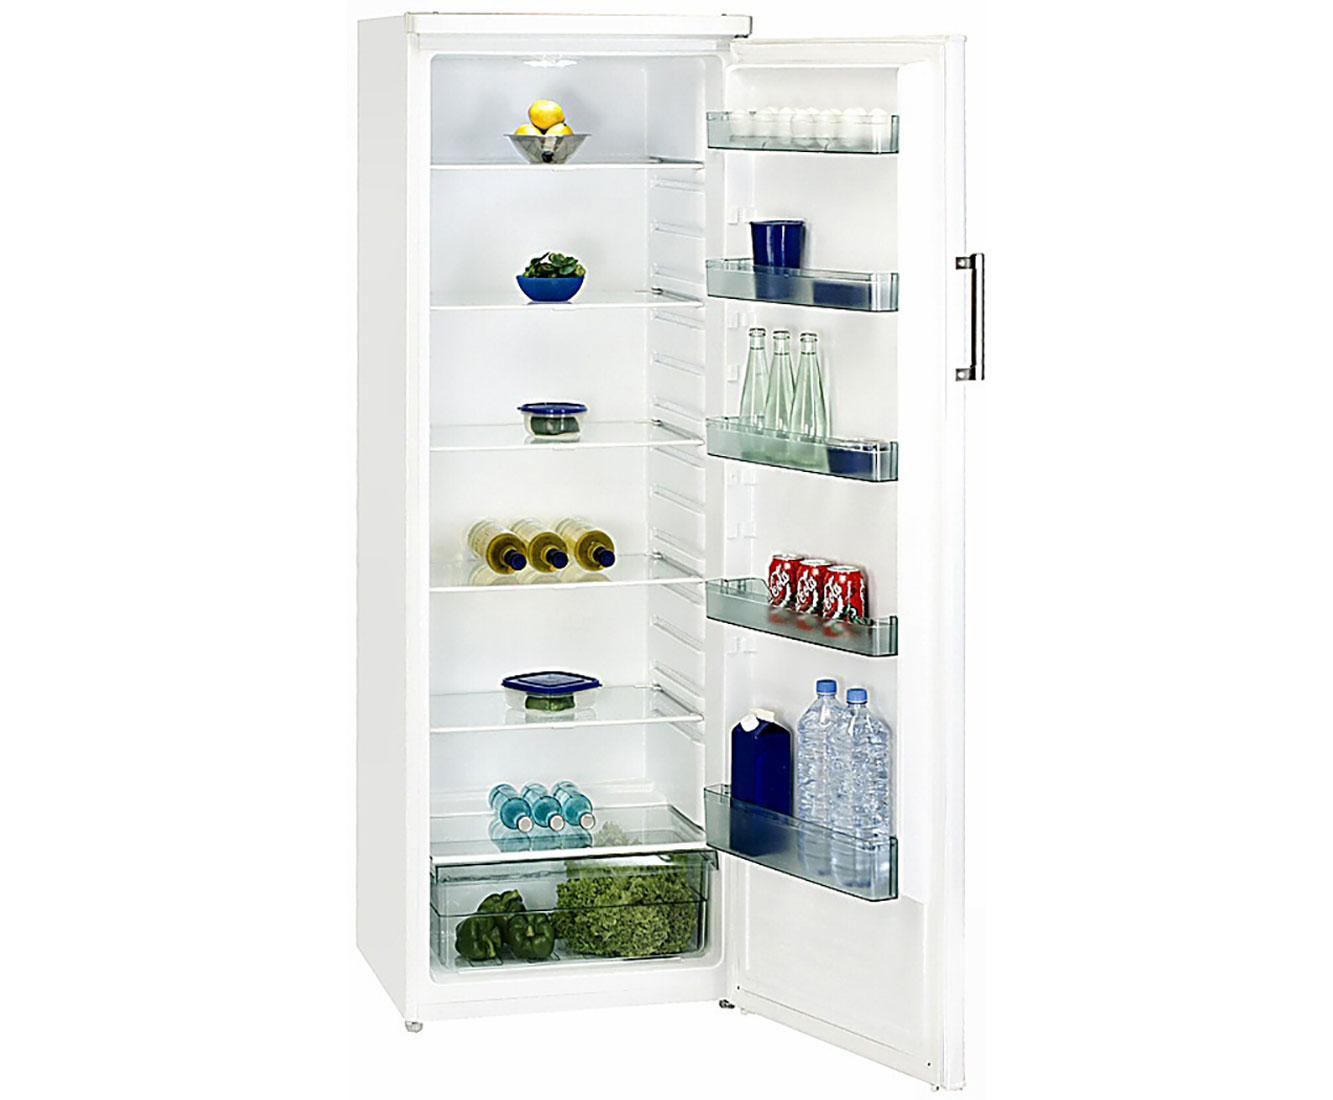 Mini Kühlschrank Exquisit : Exquisit ks350 4 a kühlschrank weiß a